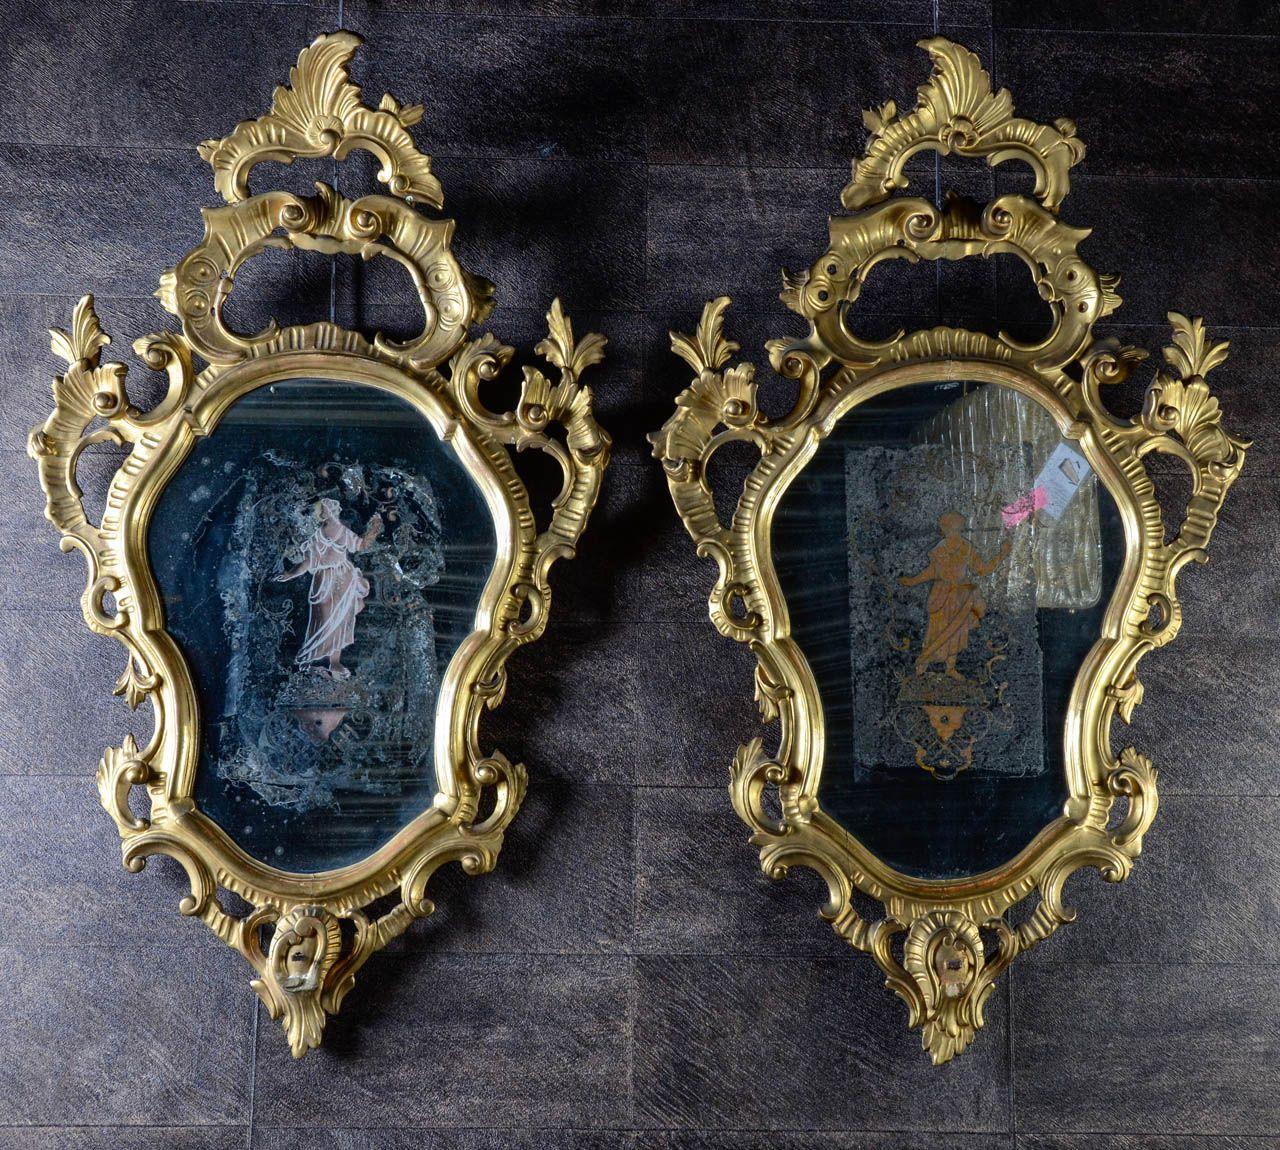 18th Century Venetian Giltwood Girandoles | From a unique collection of antique and modern girandoles at https://www.1stdibs.com/furniture/mirrors/girandoles/